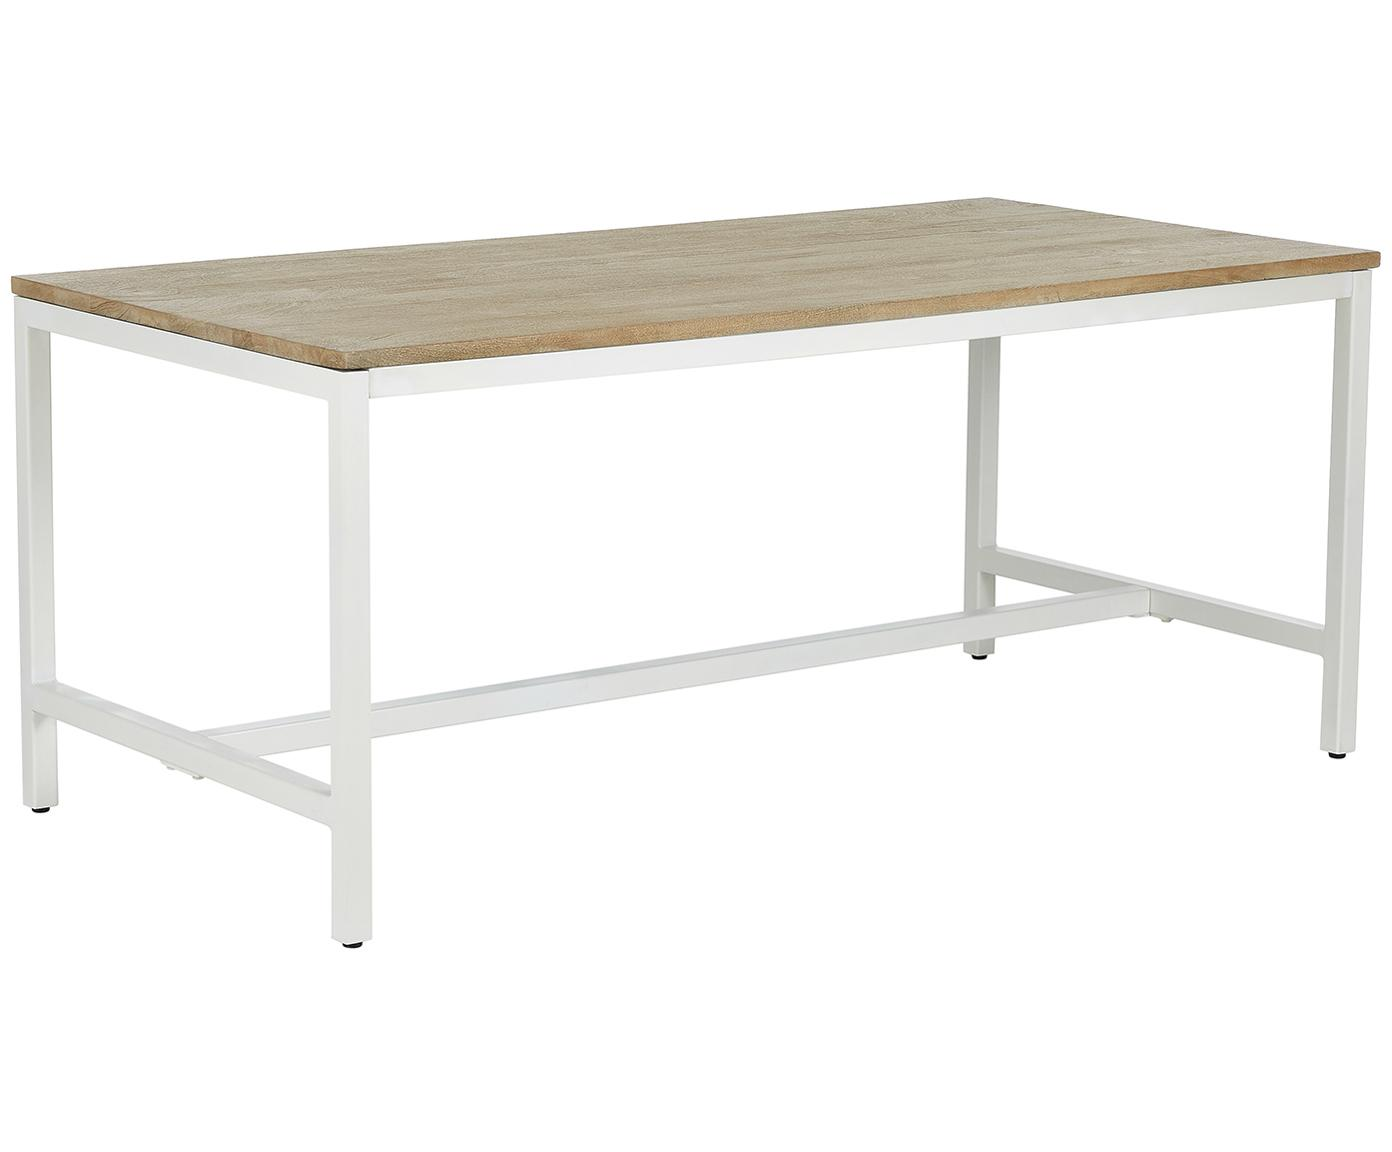 Mesa de comedor Raw, tablero de madera maciza, Tablero: madera de mango maciza, c, Estructura: metal con pintura en polv, Tablero: madera de mango Estructura: blanco mate, An 180 x F 90 cm